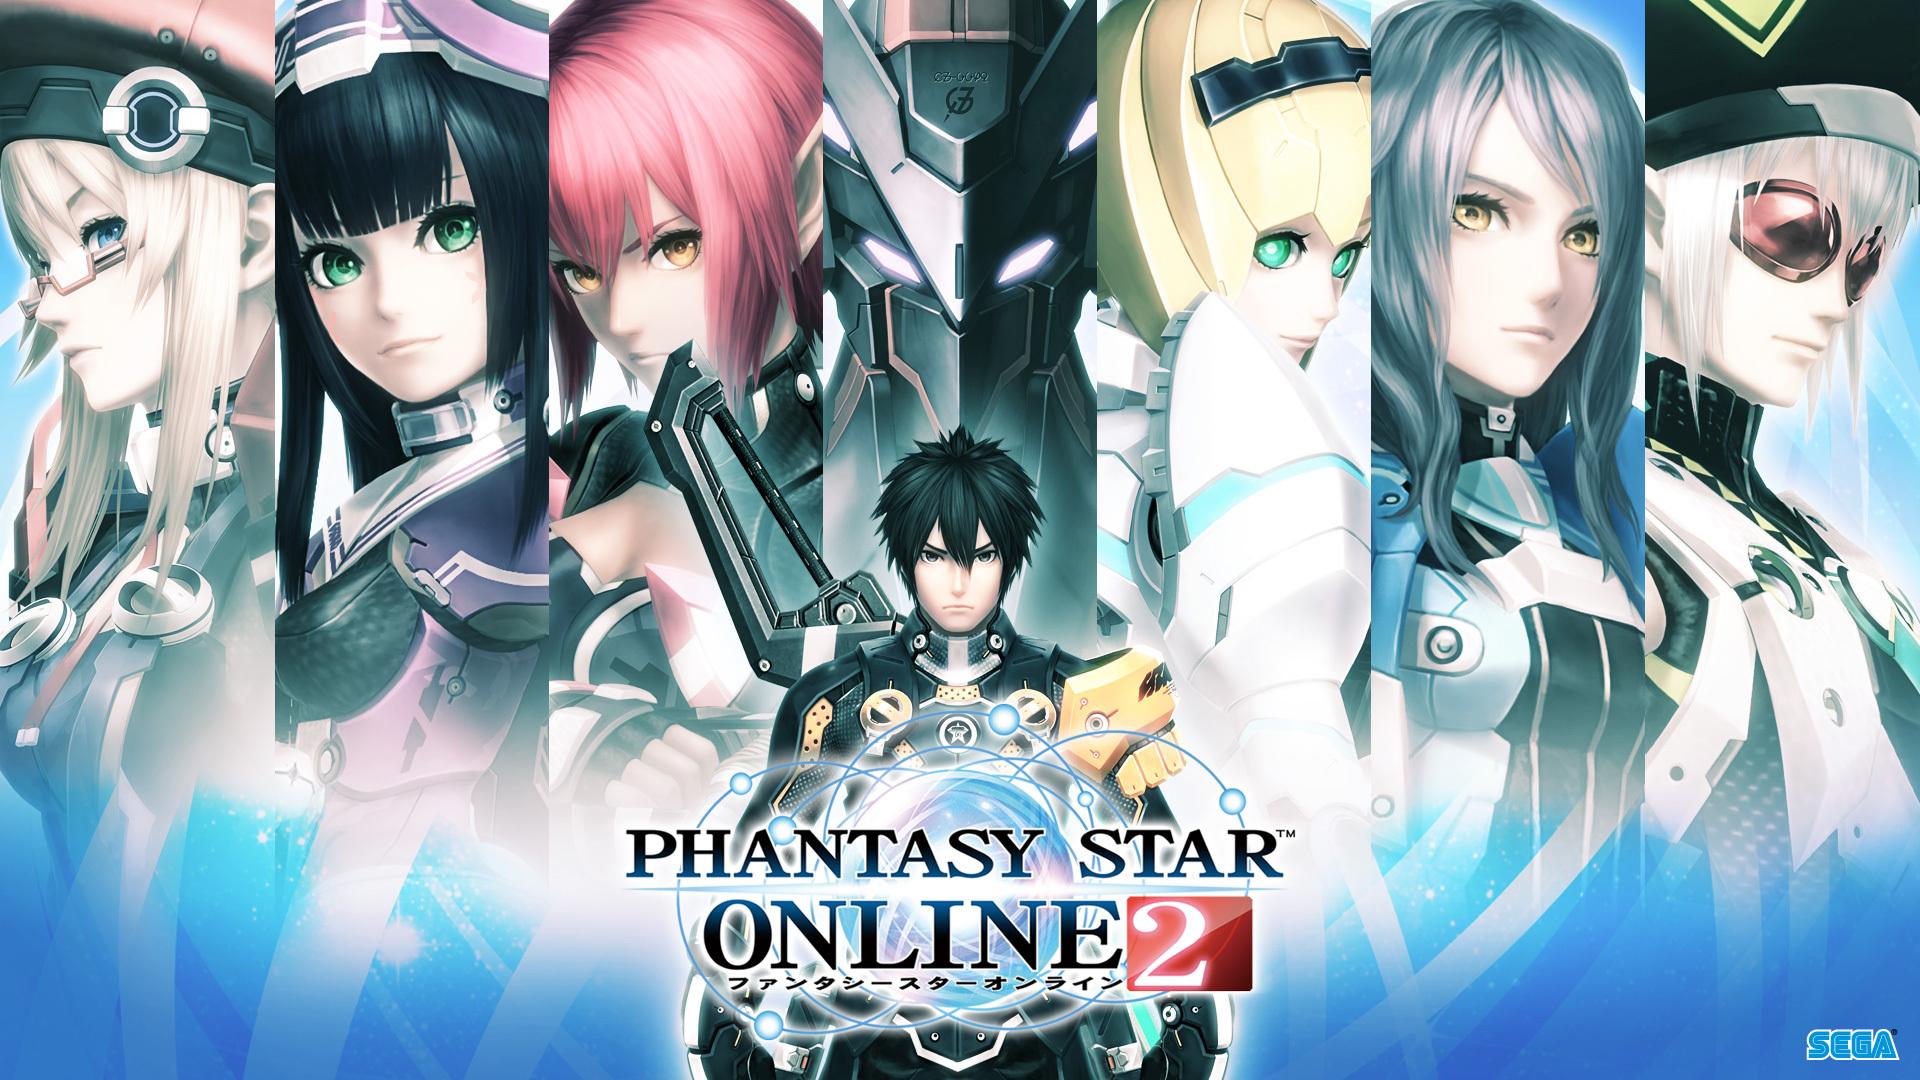 Phantasy Star Online 2 2912020 2